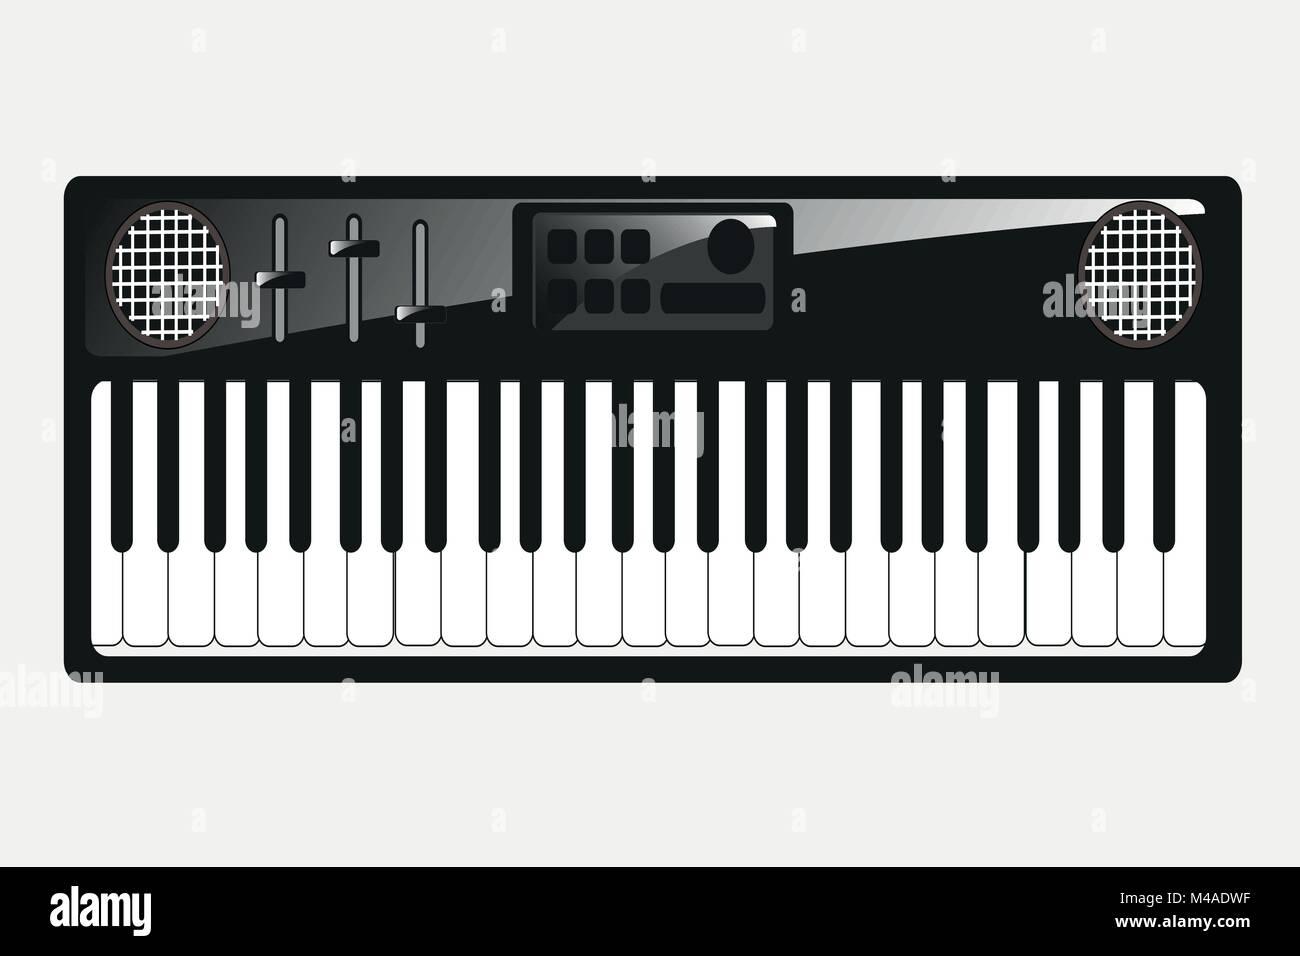 Music instrument synthesizer - Stock Image